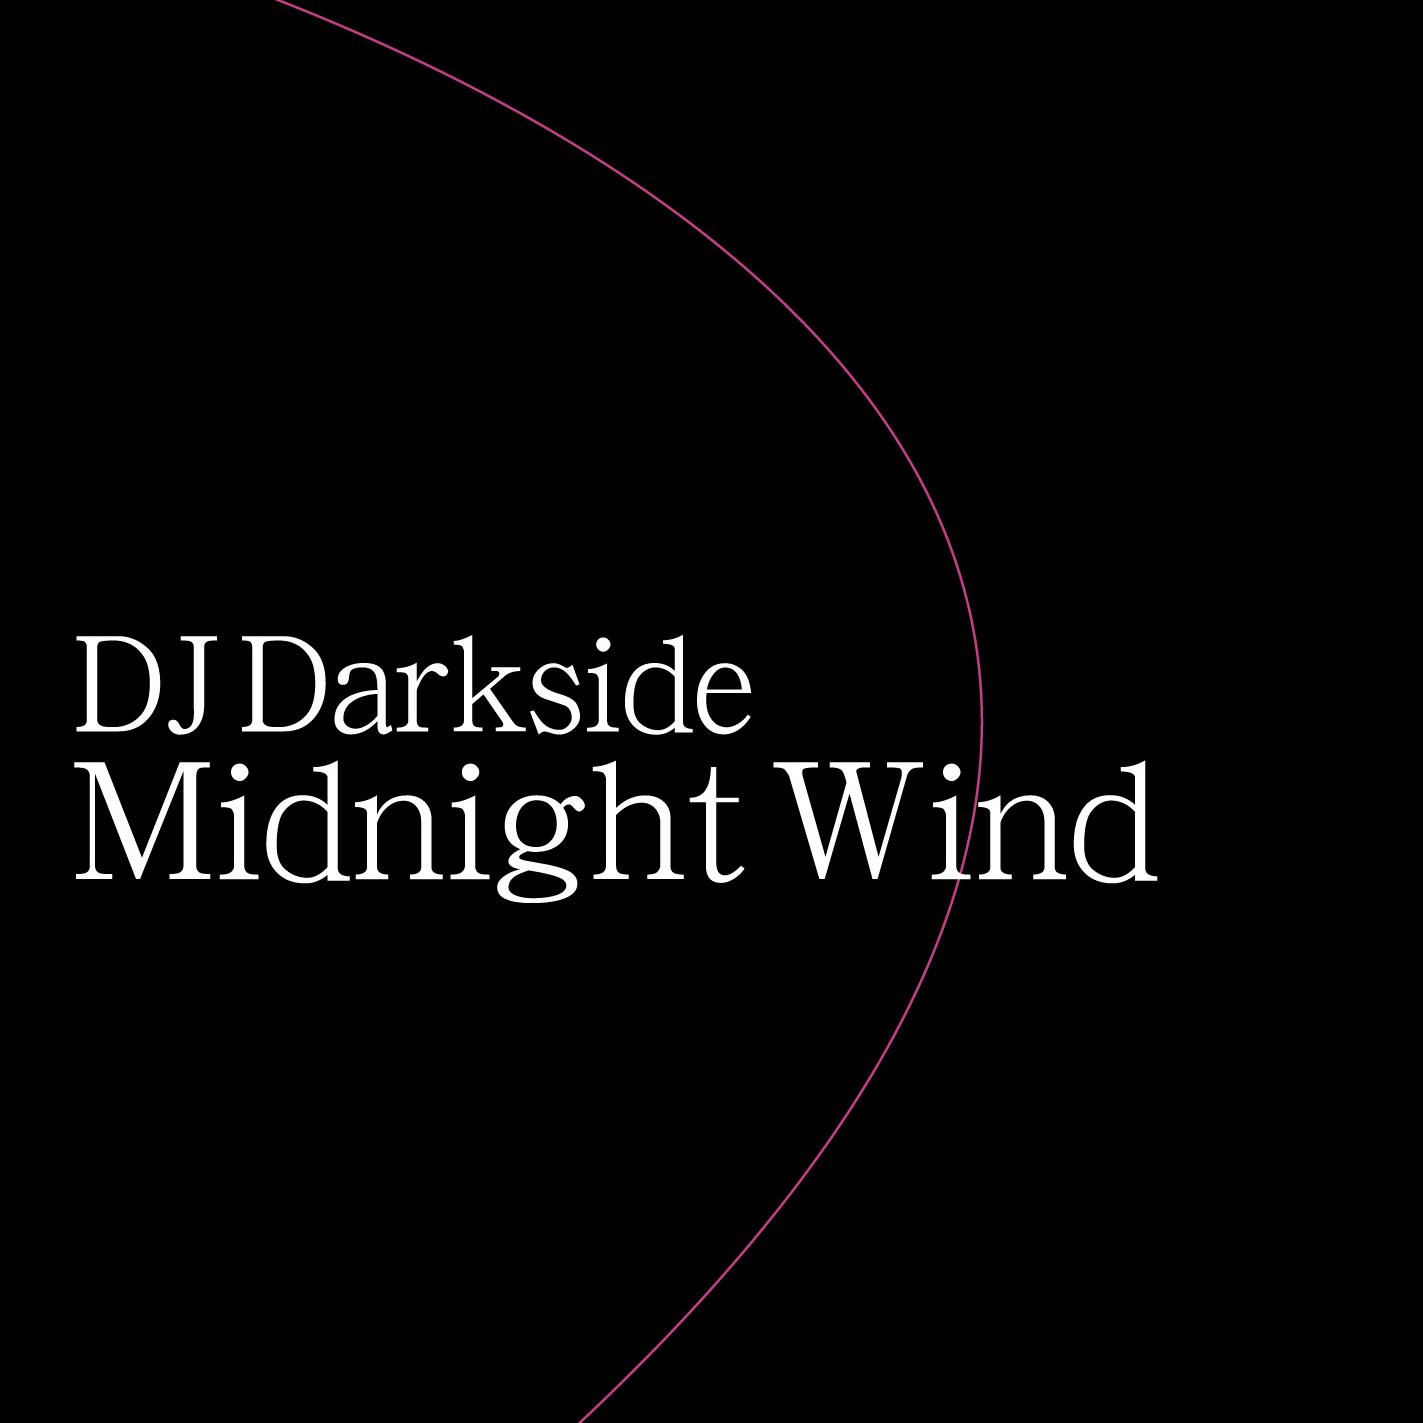 Midnight Wind